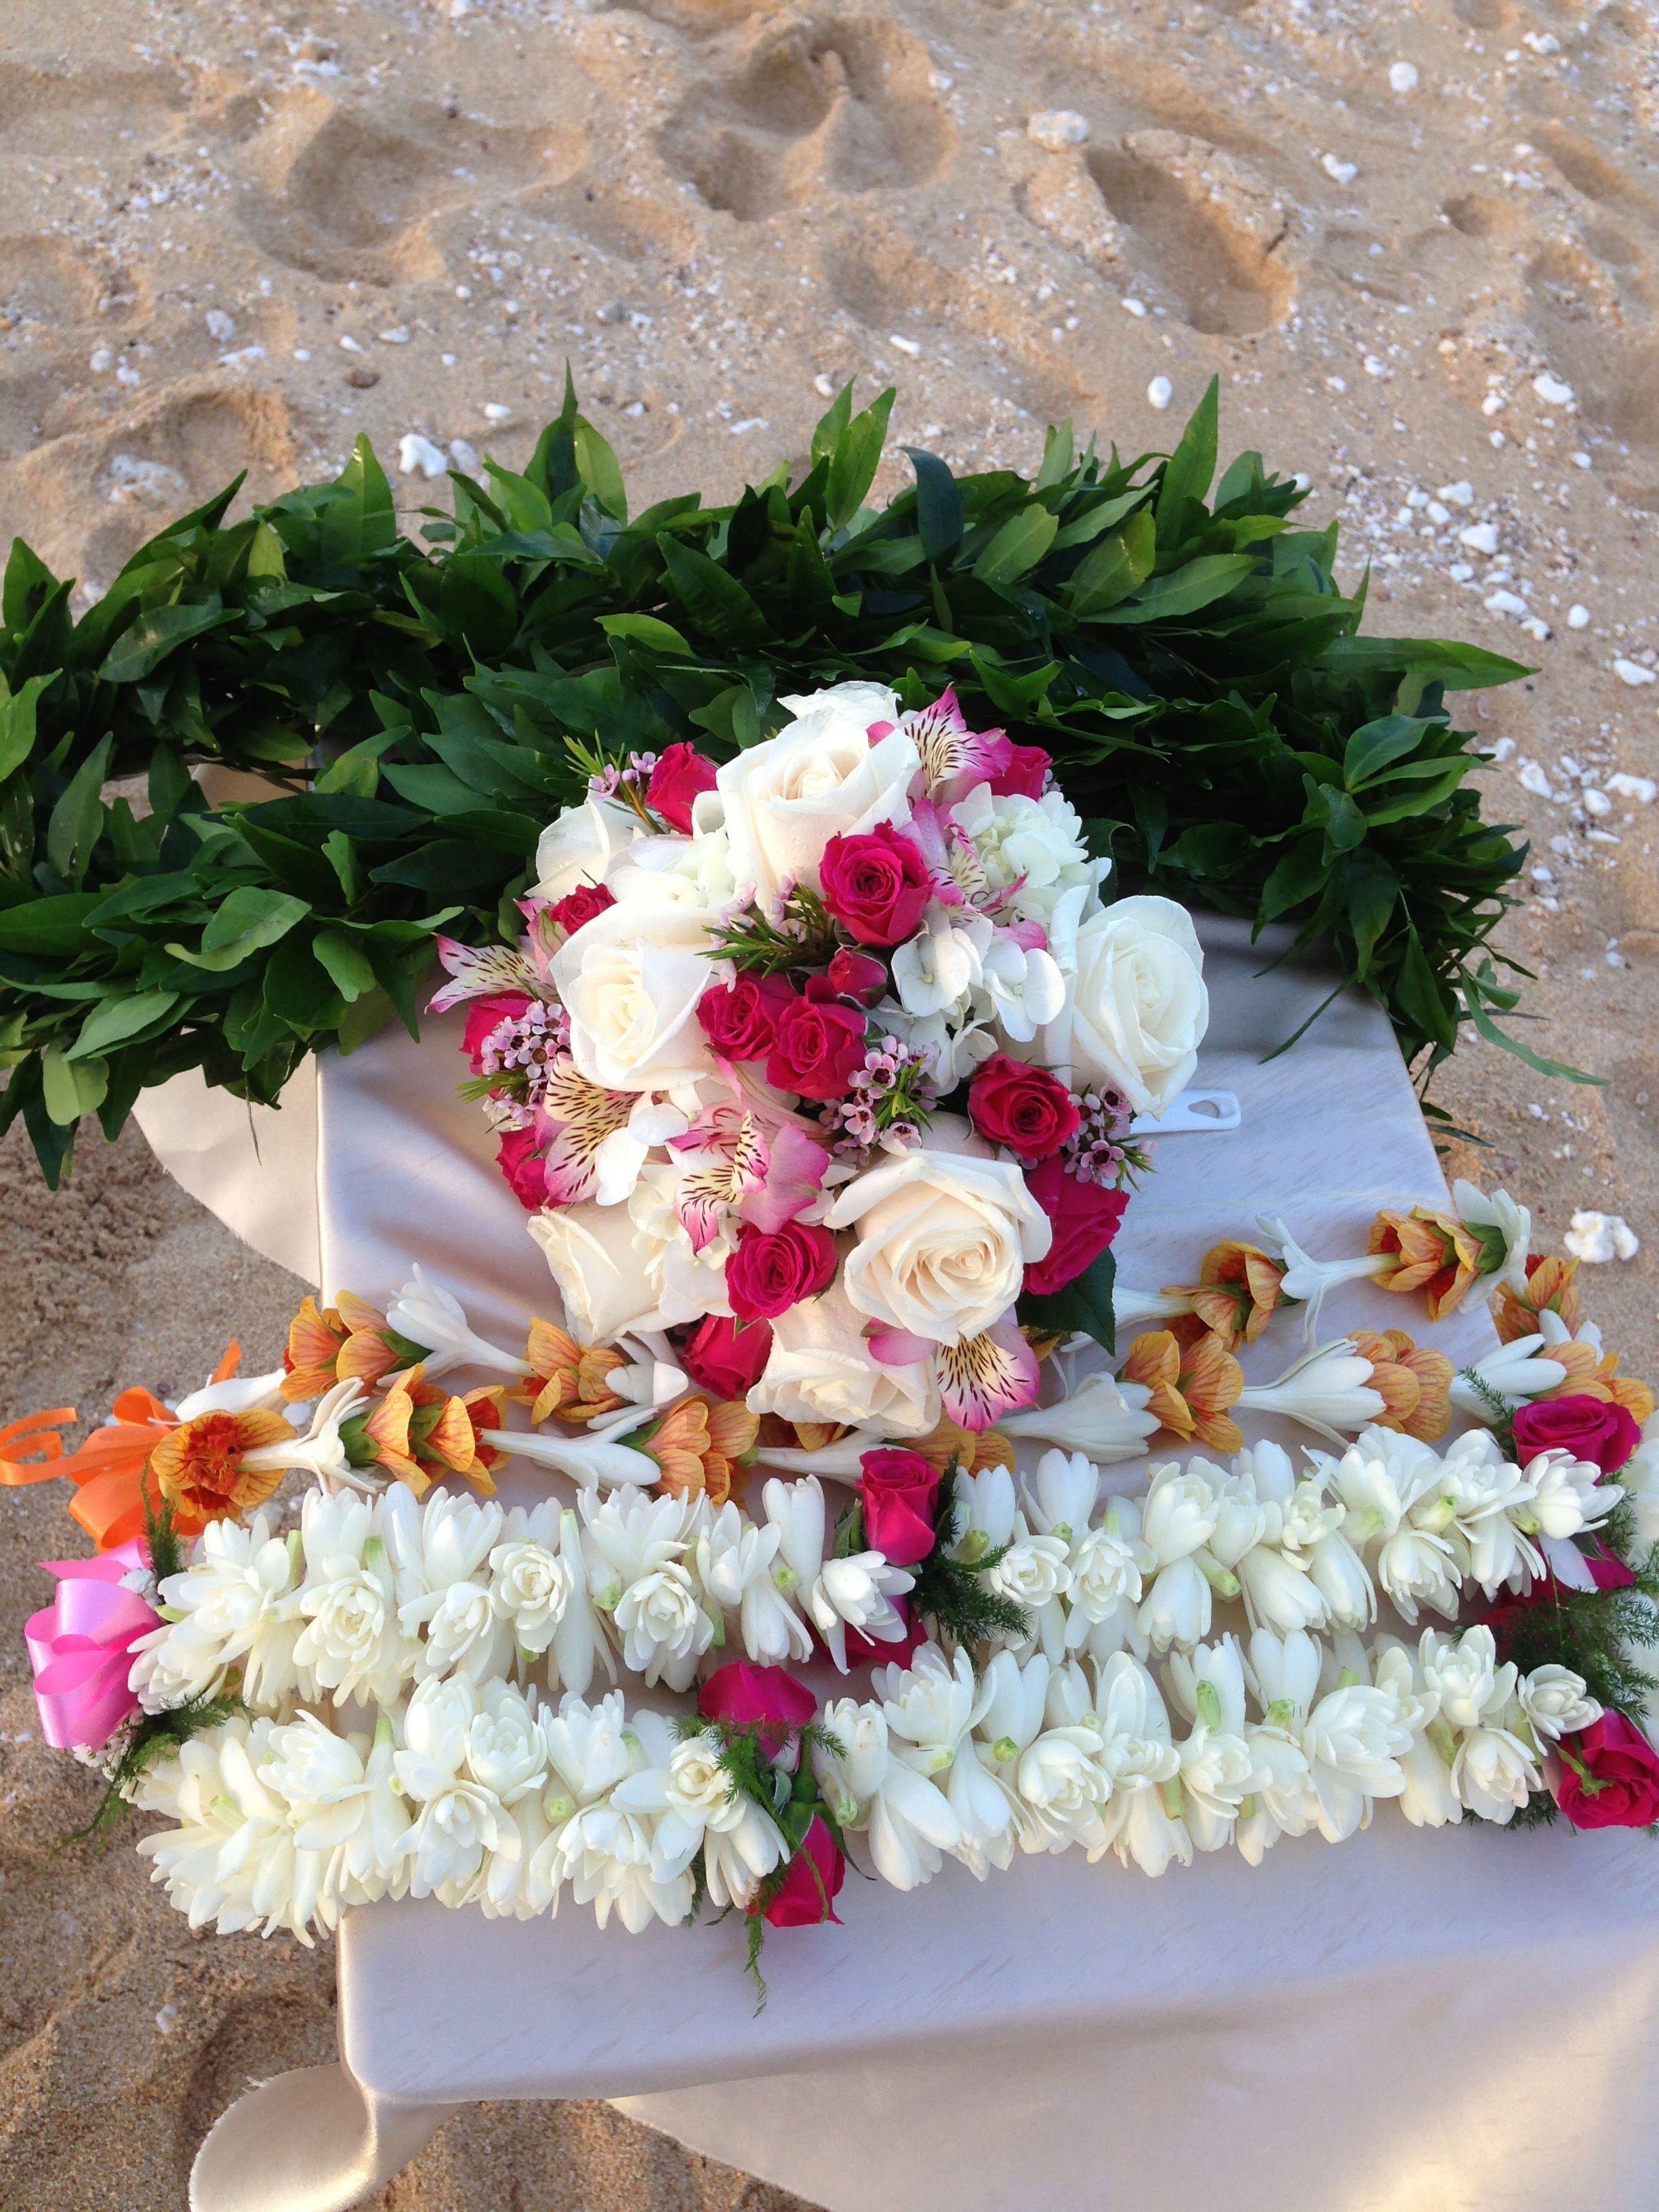 Islander weddings in honolulu hawaii provides colorful flower islander weddings in honolulu hawaii provides colorful flower bouquets and beautiful leis made of tuberose izmirmasajfo